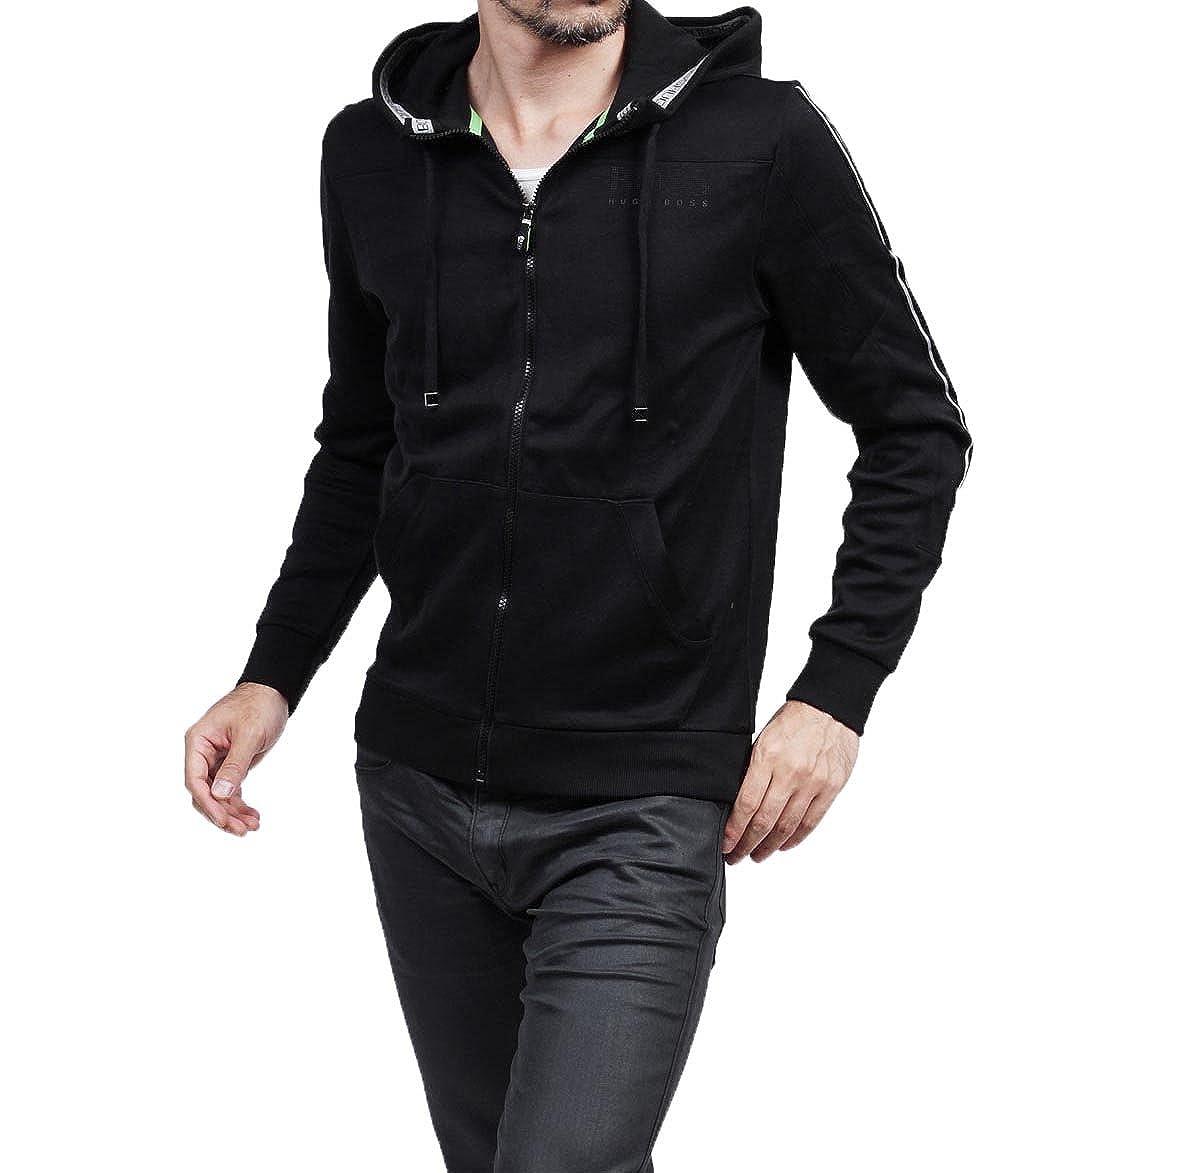 Image of Active Tracksuits Hugo Boss Men's Saggy Hakibo Black CottonTracksuit Sweatsuit